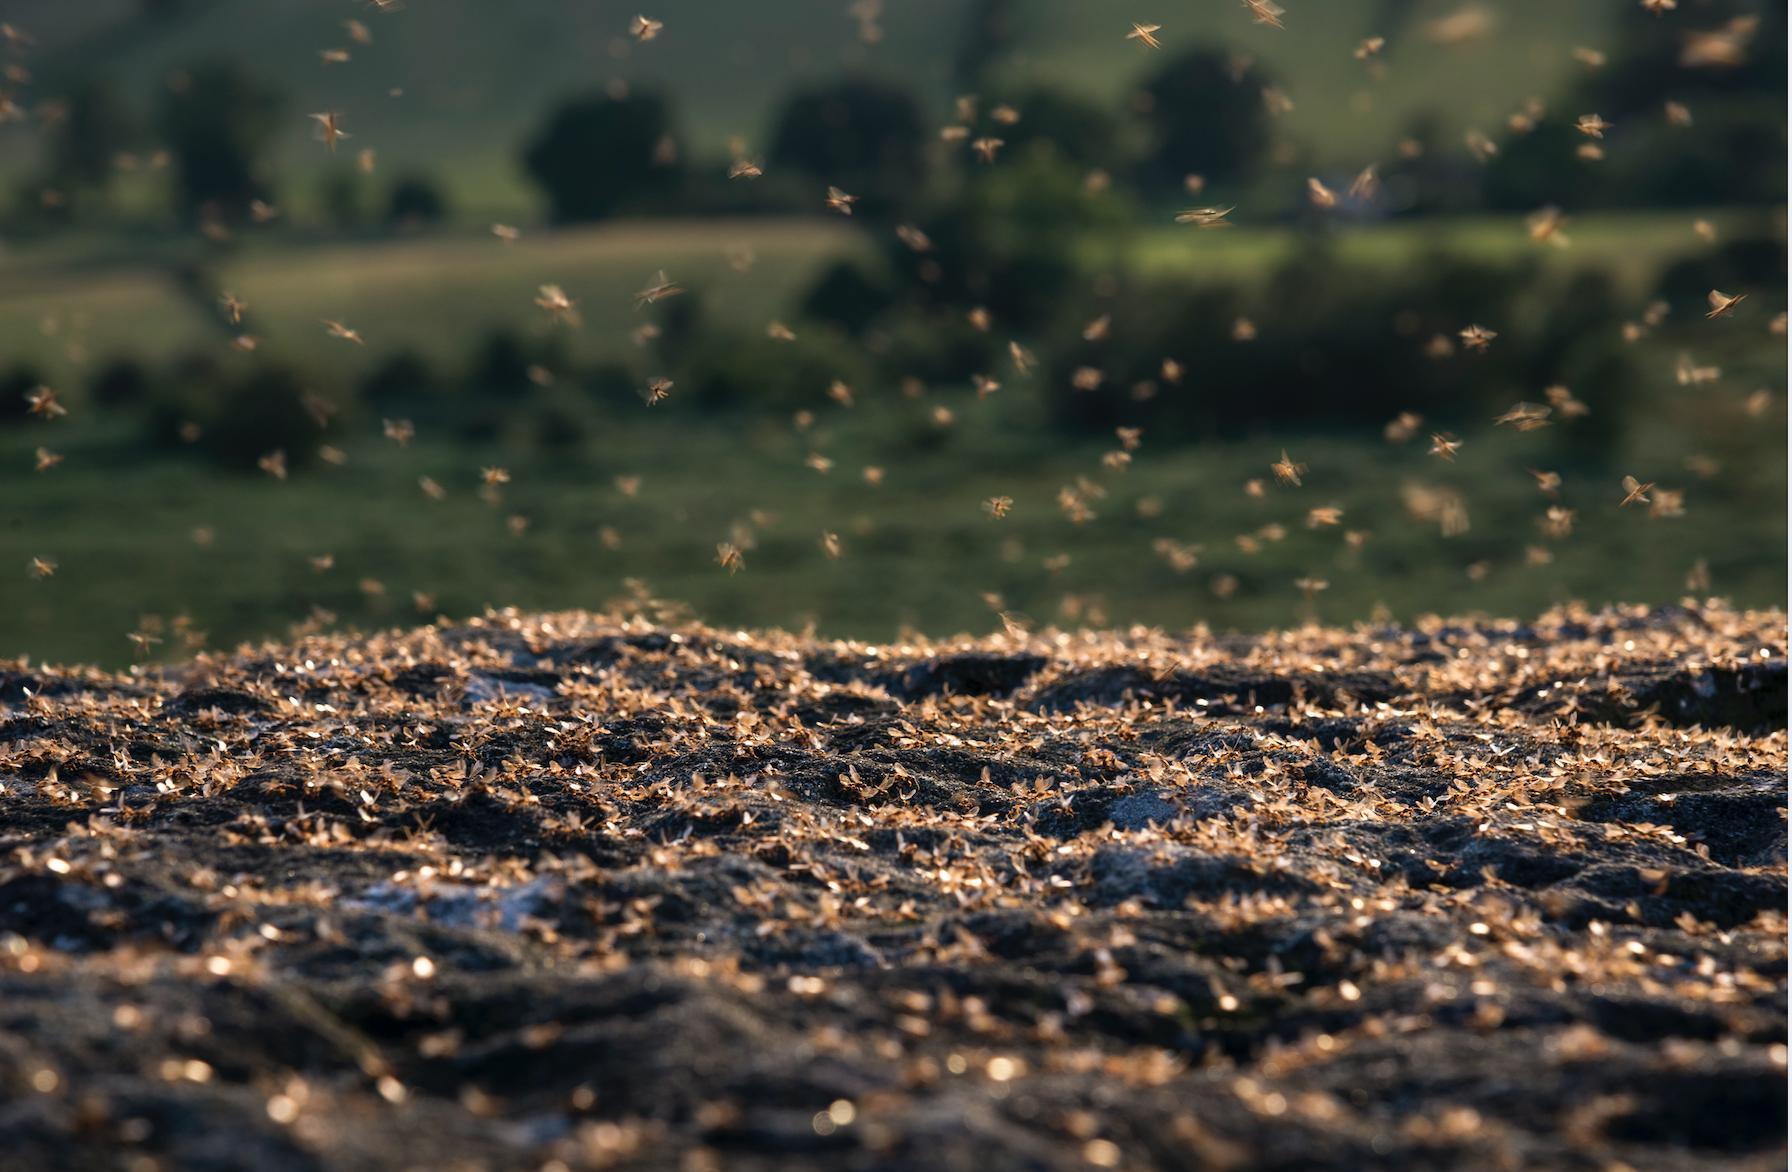 Flying ants 2